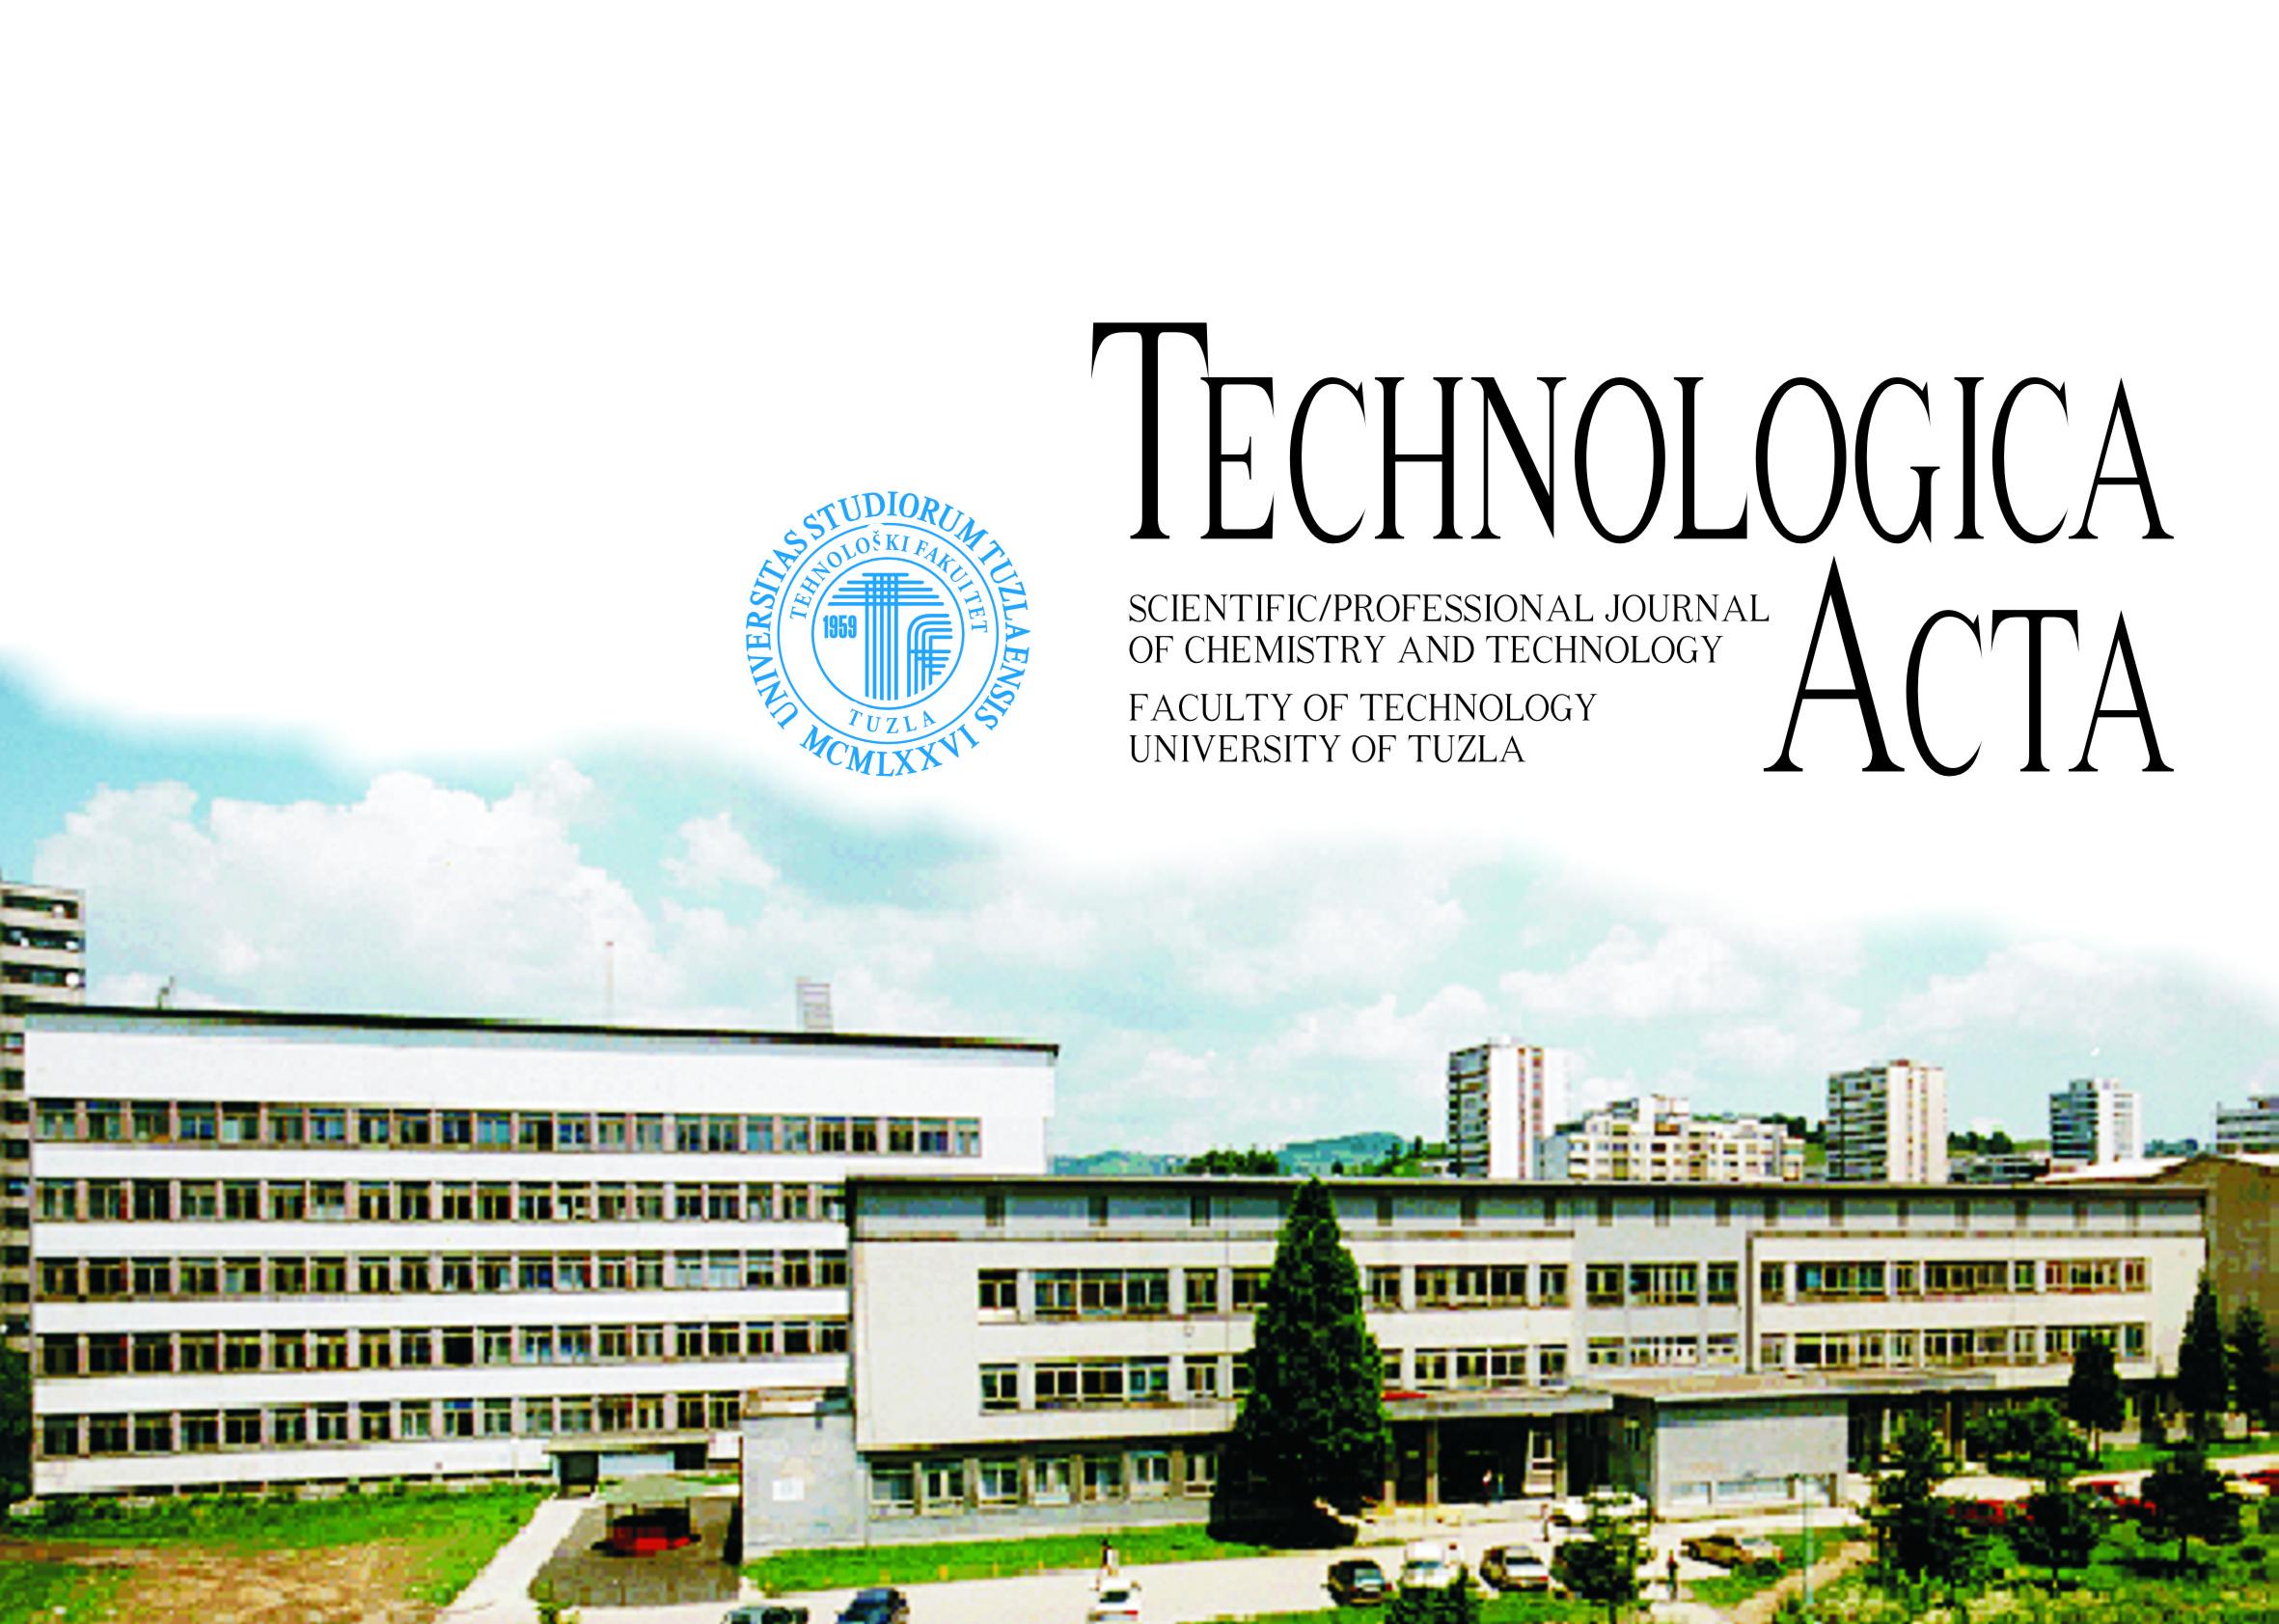 Technologica Acta